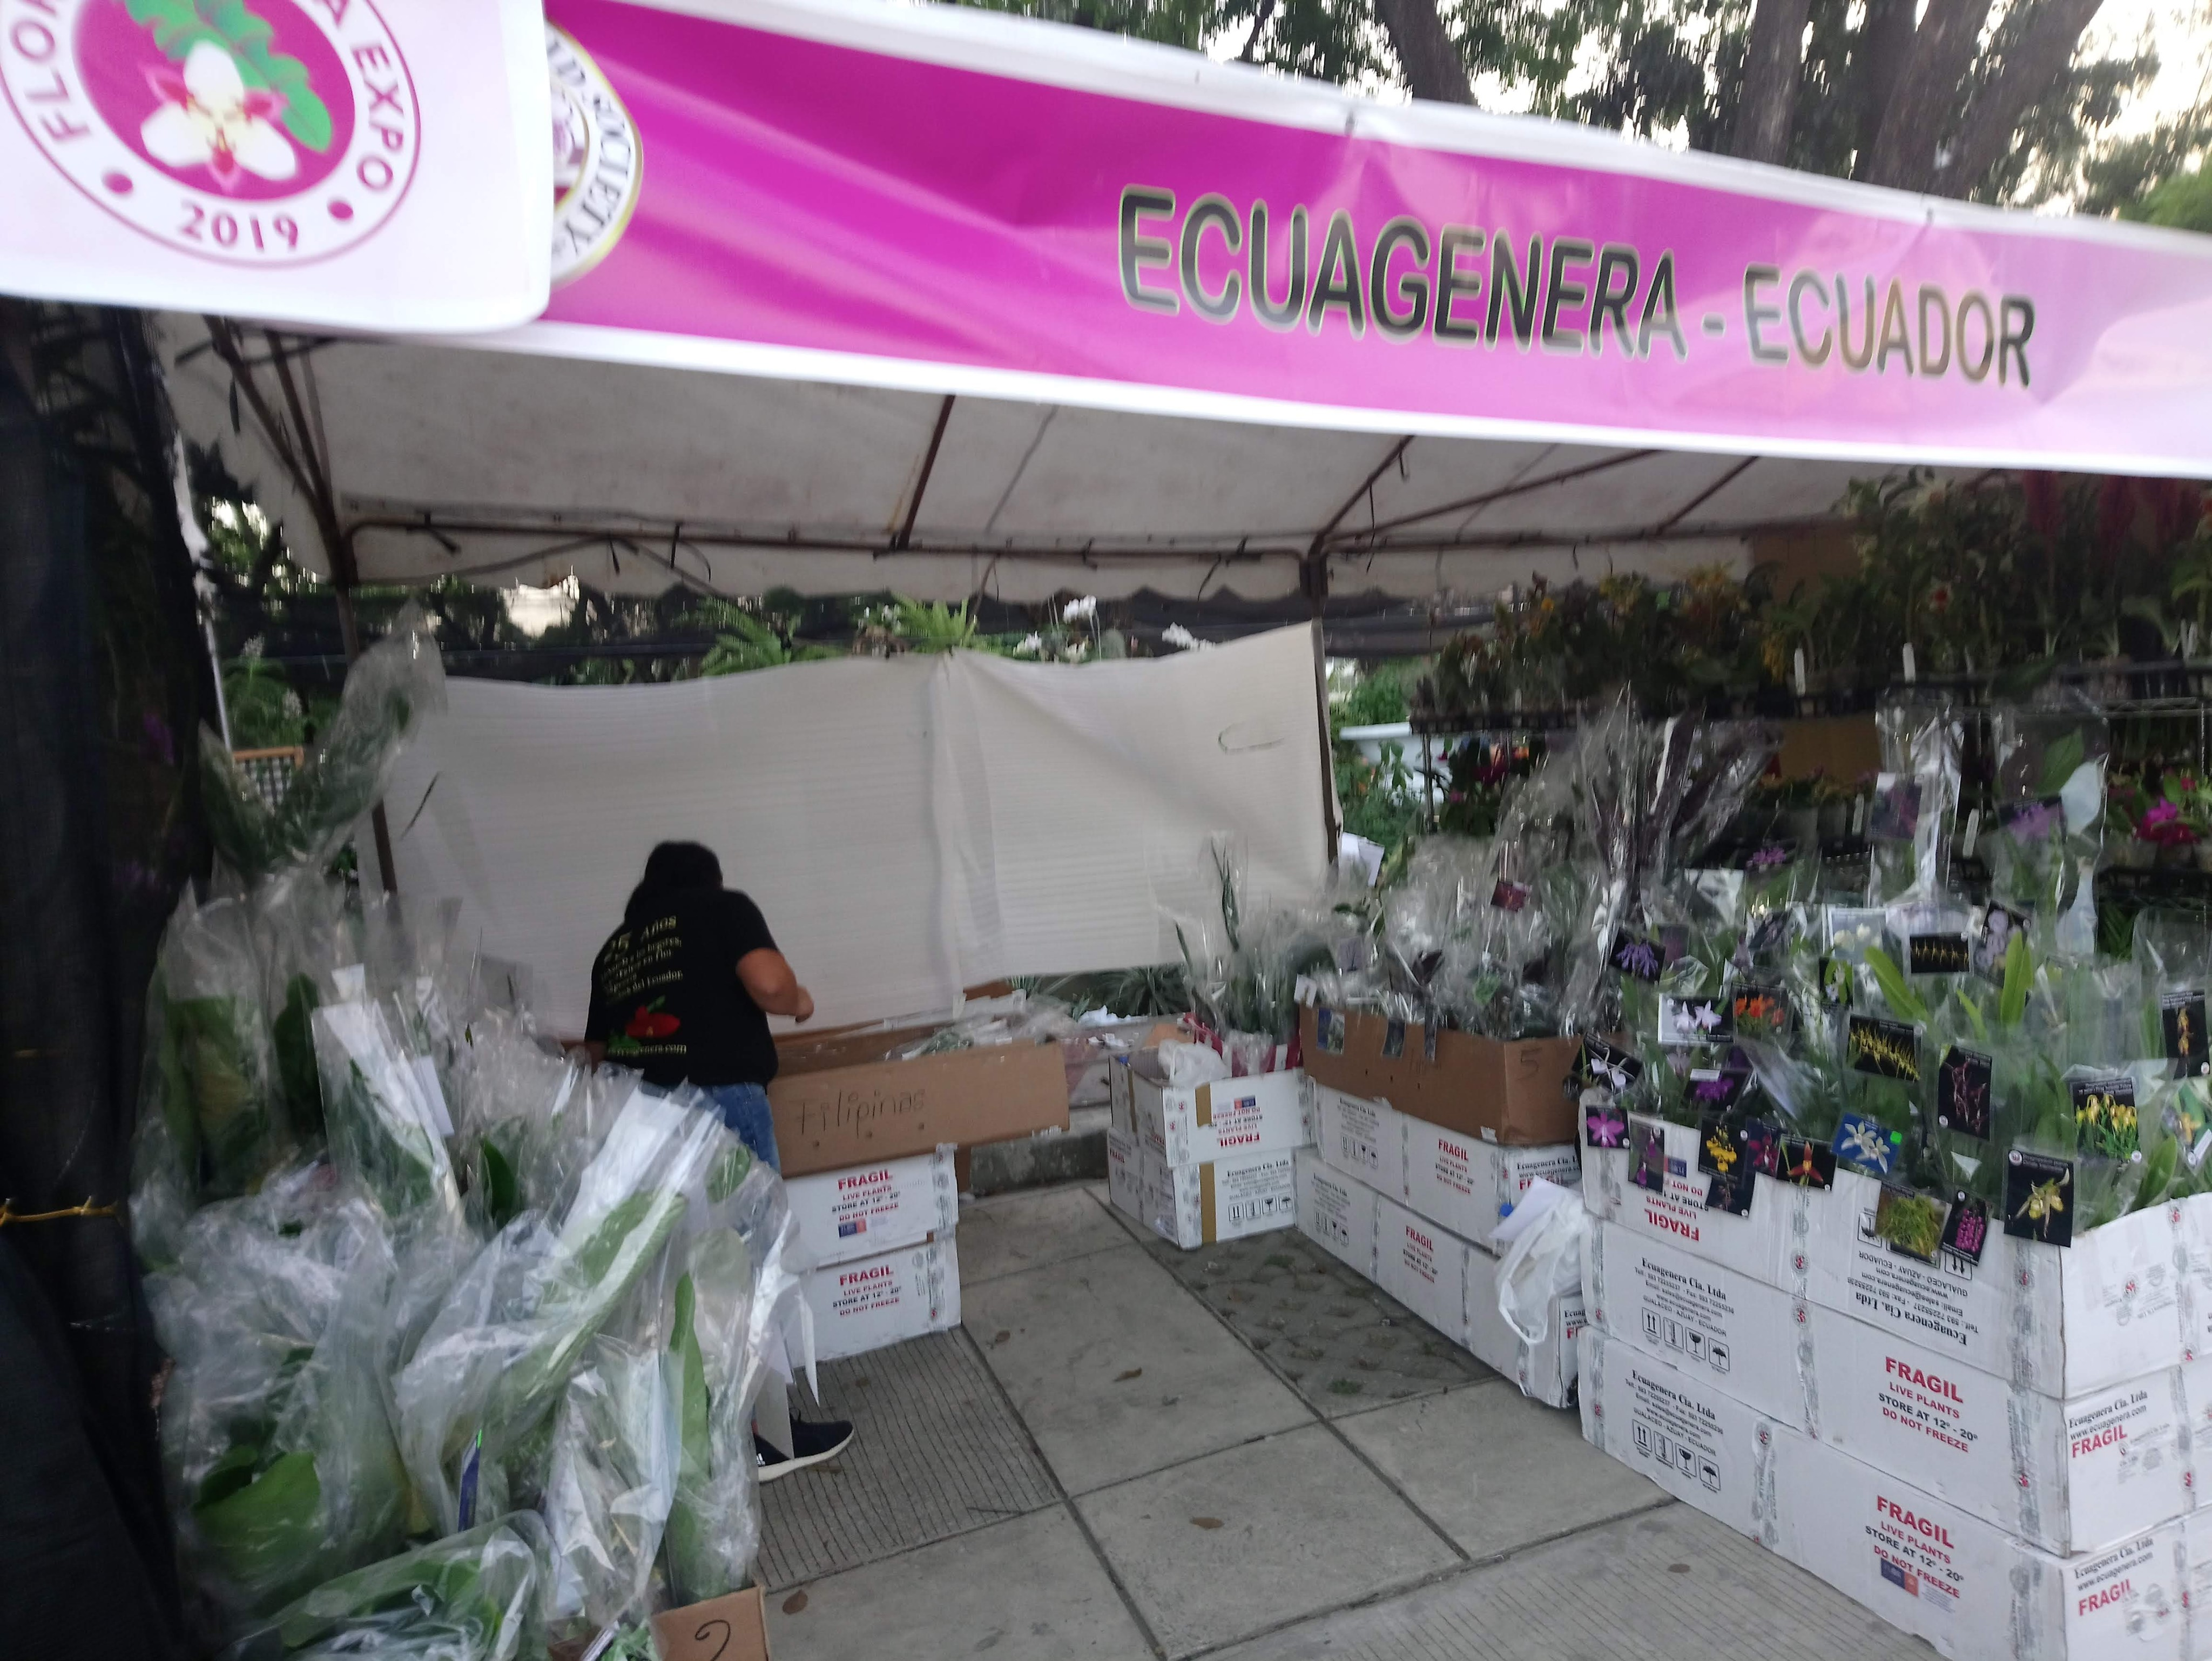 ecuagenera-ecuador